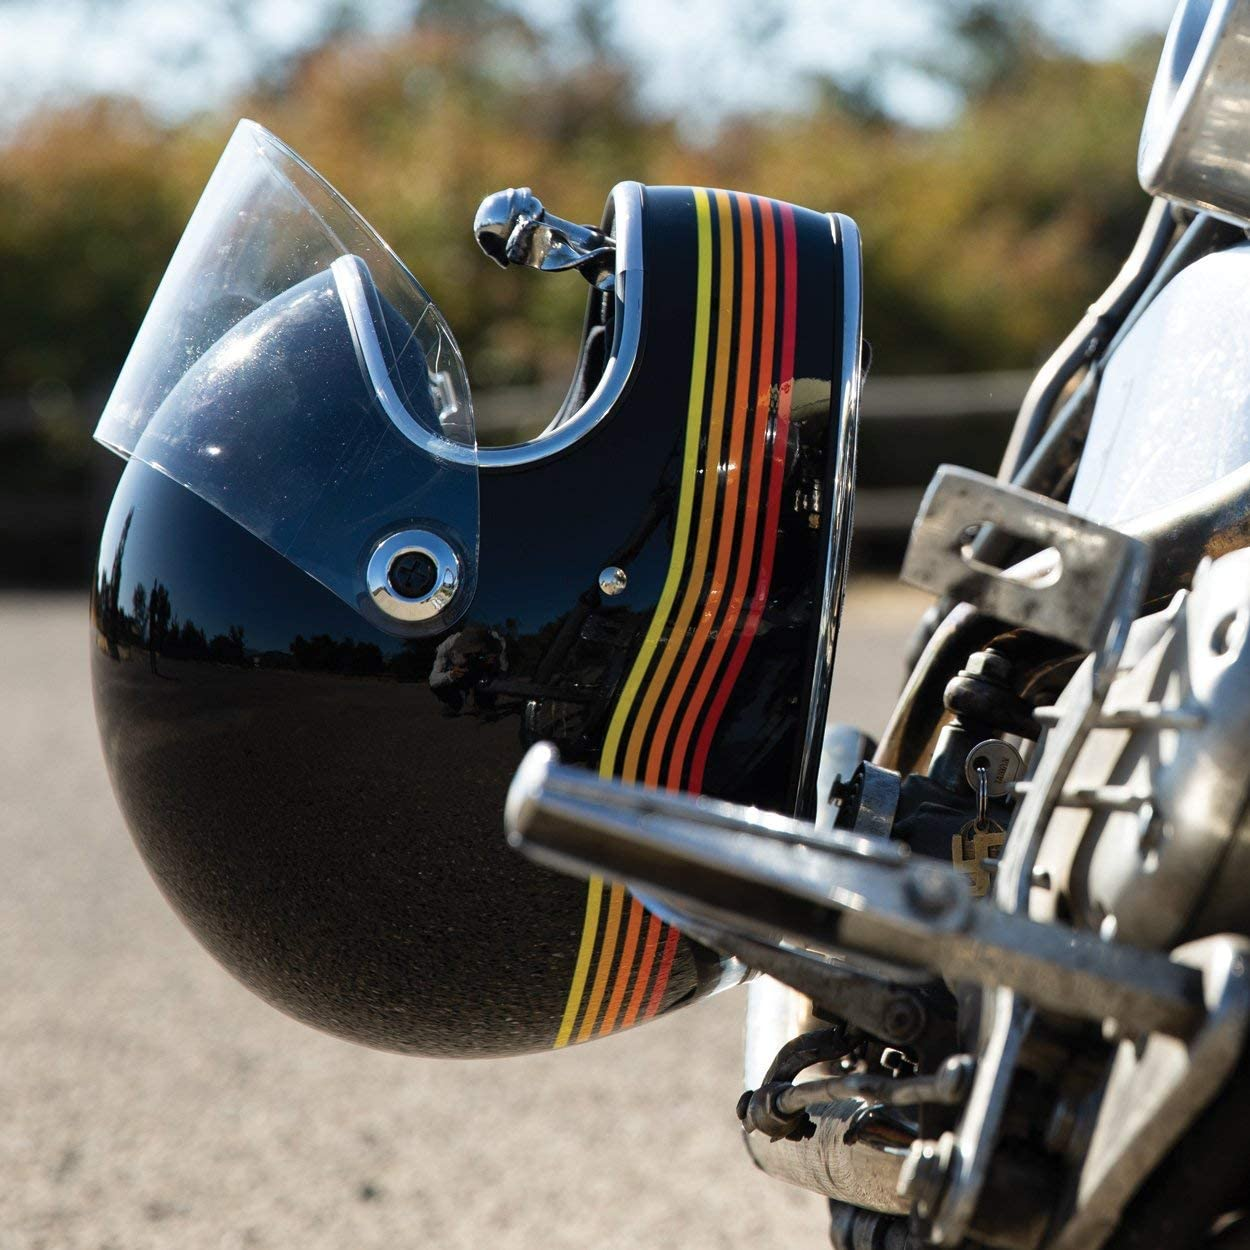 Europa Integralhelm Biltwell Gringo S Schwarz gl/änzend Gloss Black Spectrum zugelassen Doppelt zugelassen ECE America /& DOT Helmet Biker Custom Vintage Retro Anno 70 Gr/ö/ße XL